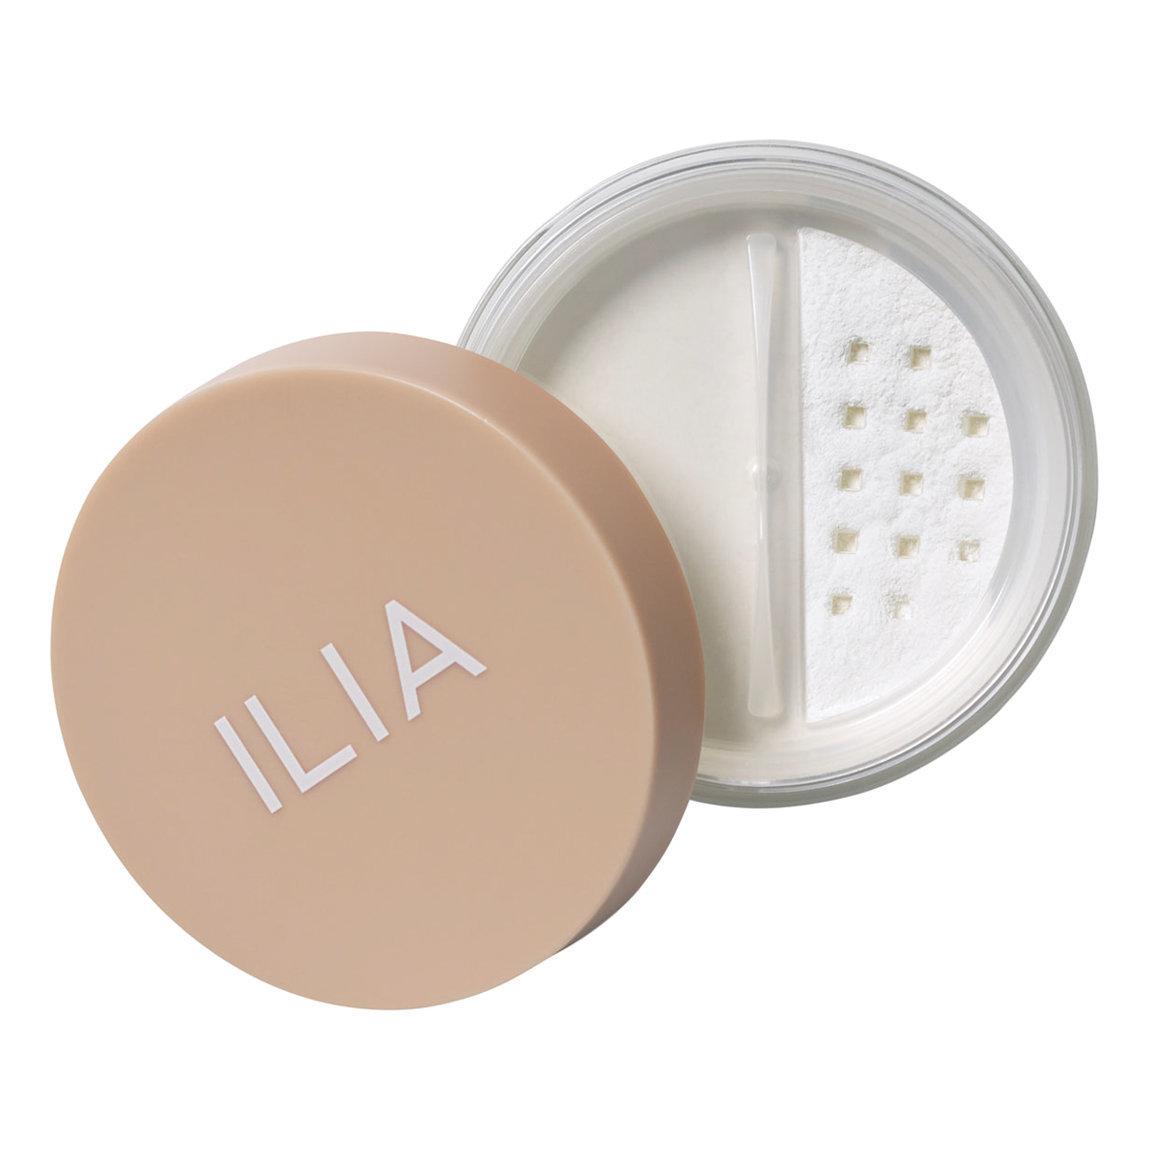 ILIA Soft Focus Finishing Powder alternative view 1 - product swatch.